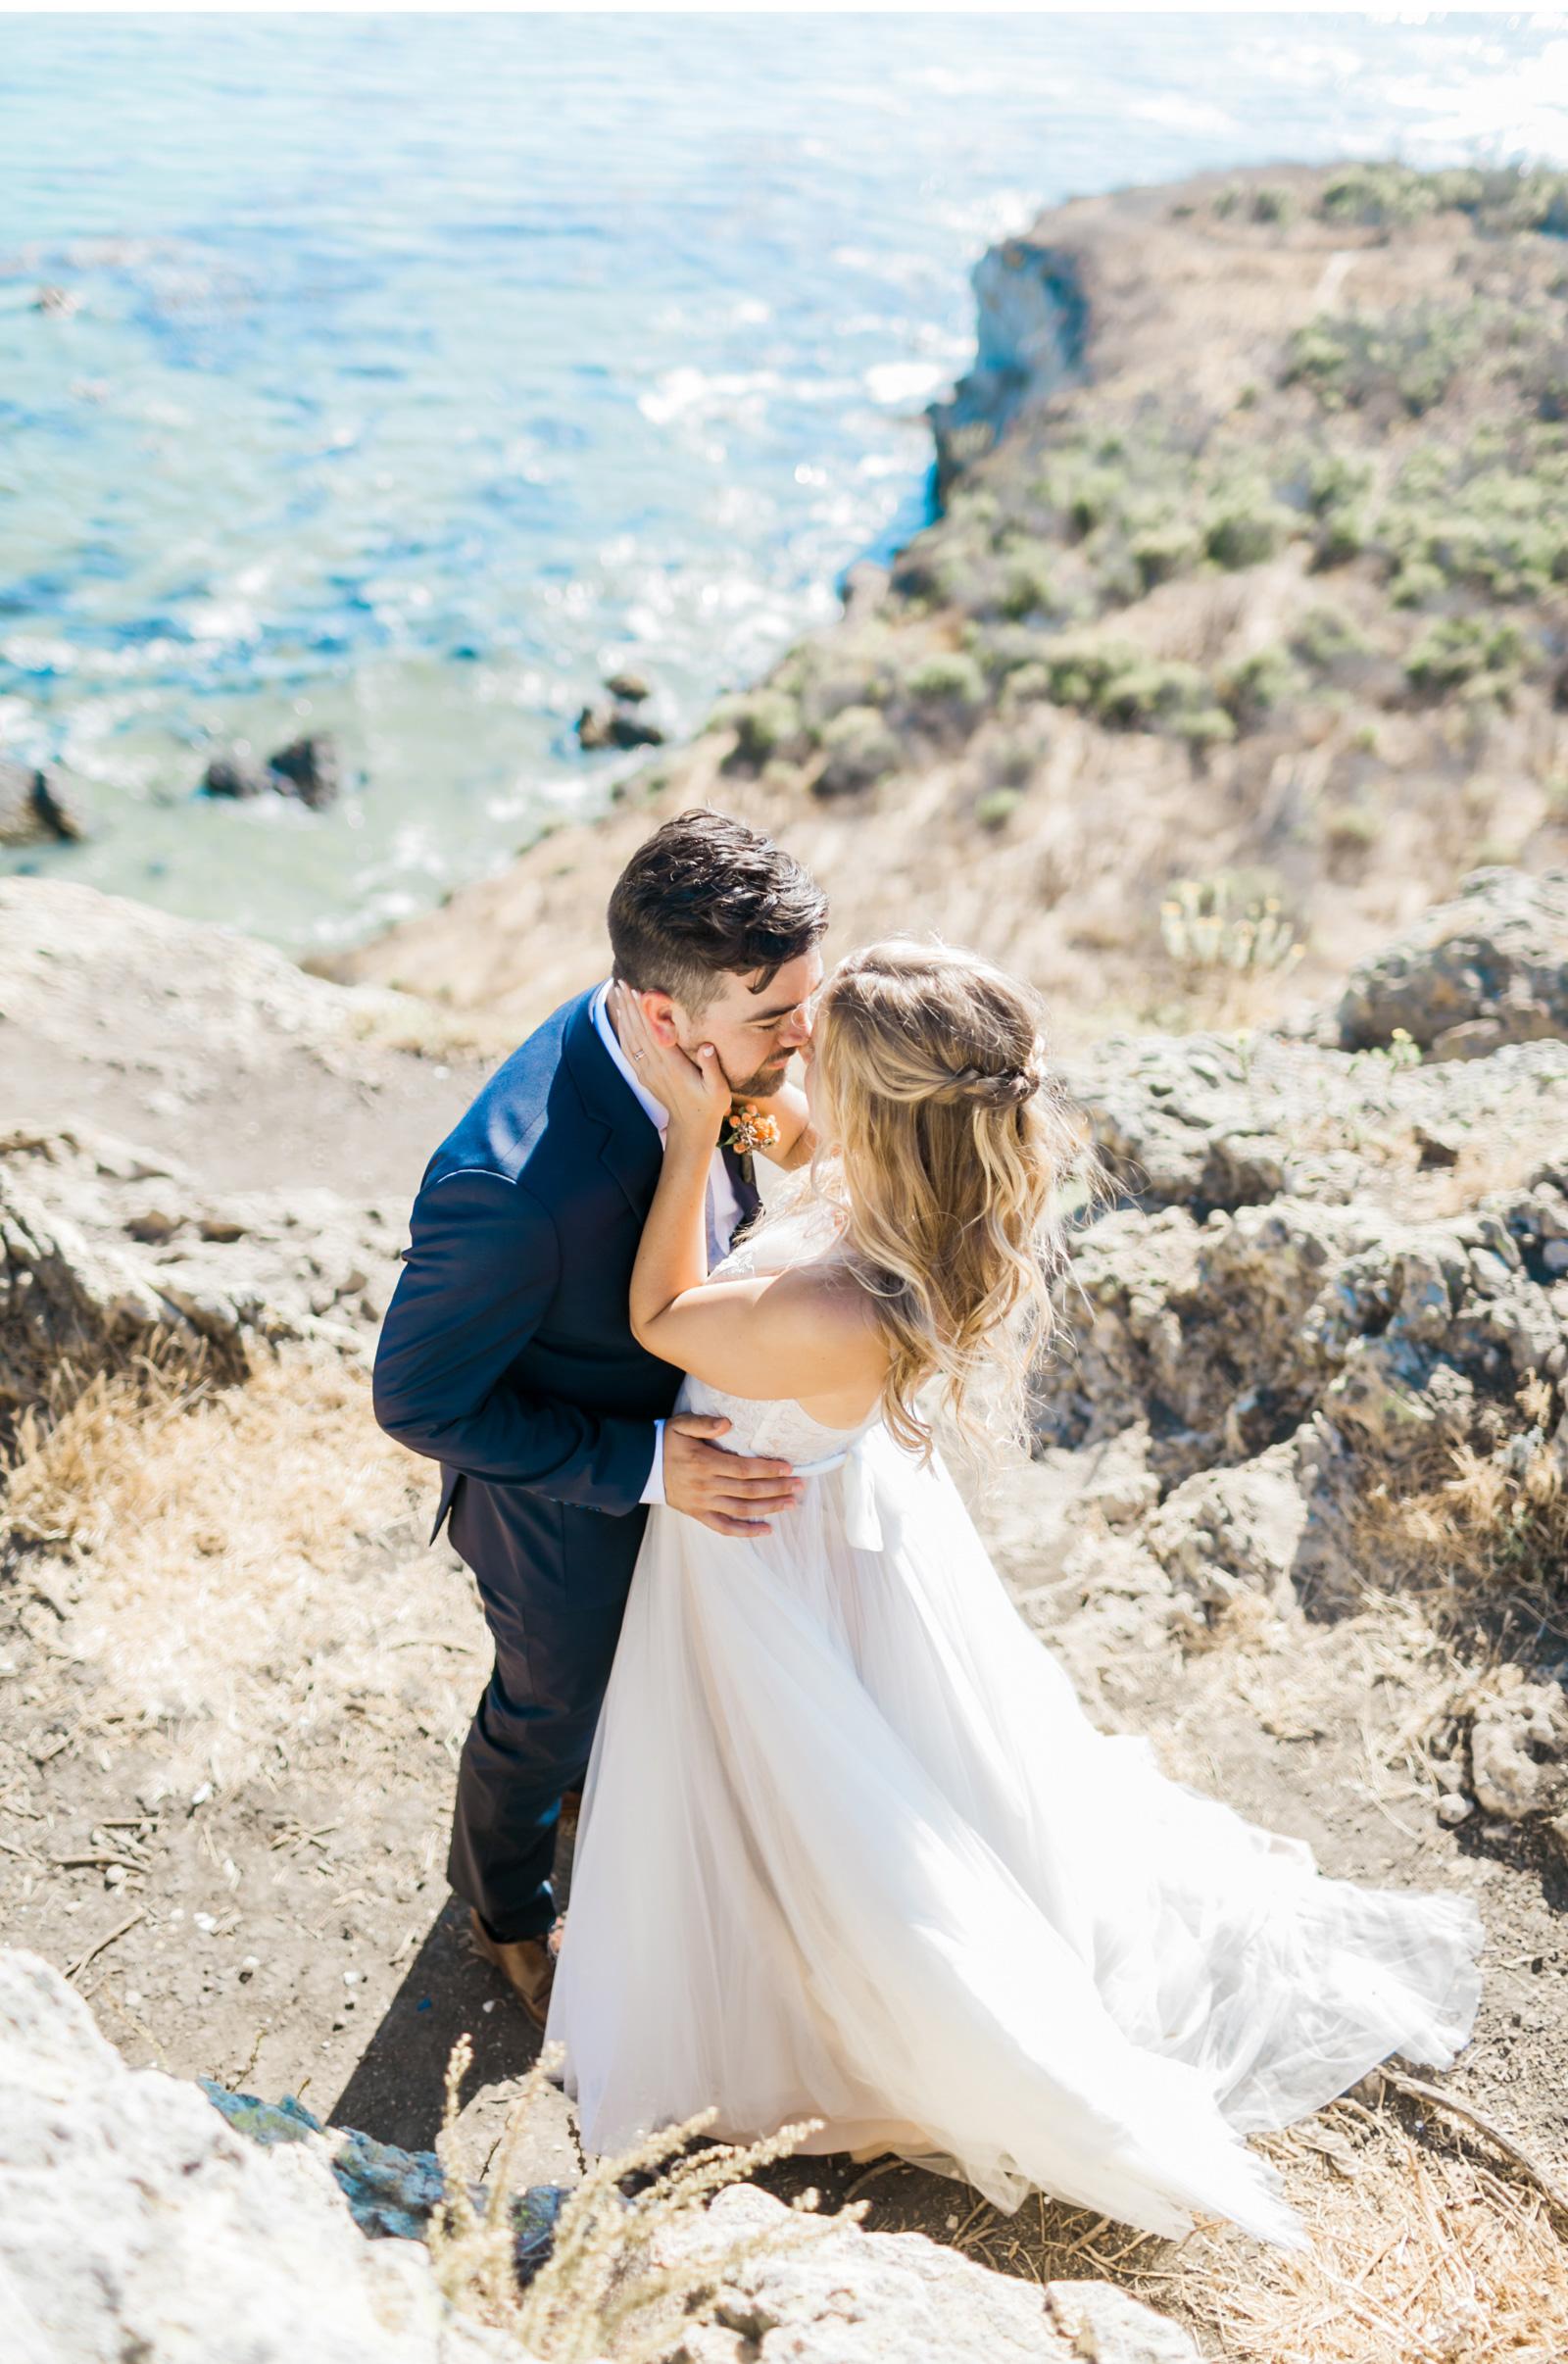 Style-Me-Pretty-San-Luis-Obispo-Wedding-Natalie-Schutt-Photography_01.jpg